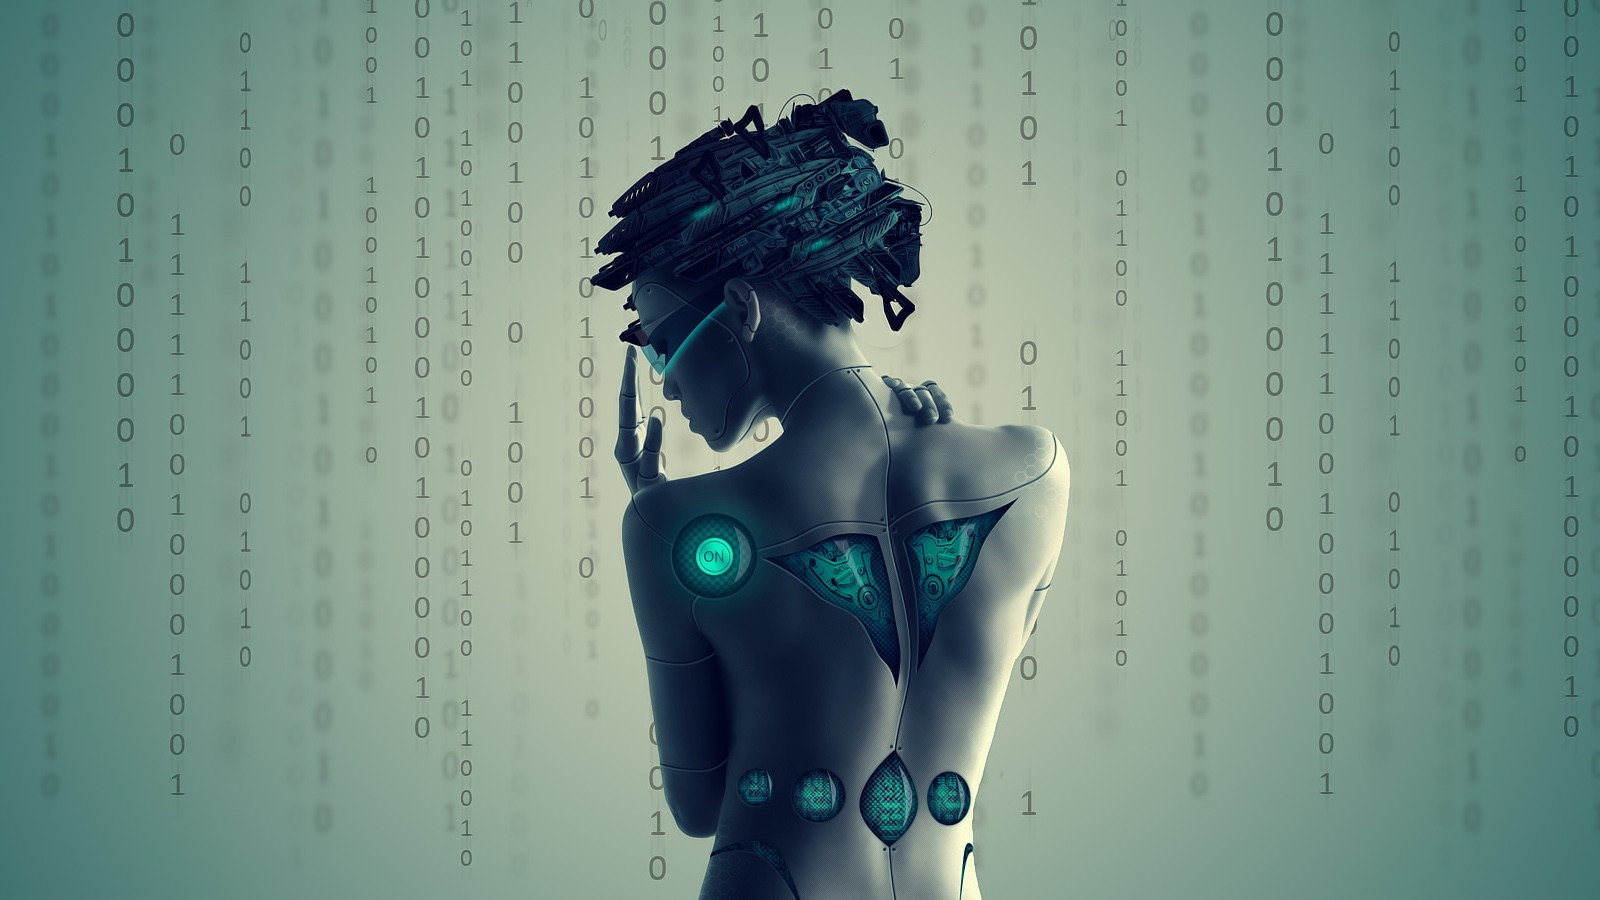 General 1600x900 cyberpunk cyborg artwork digital art women binary futuristic machine science fiction numbers visors